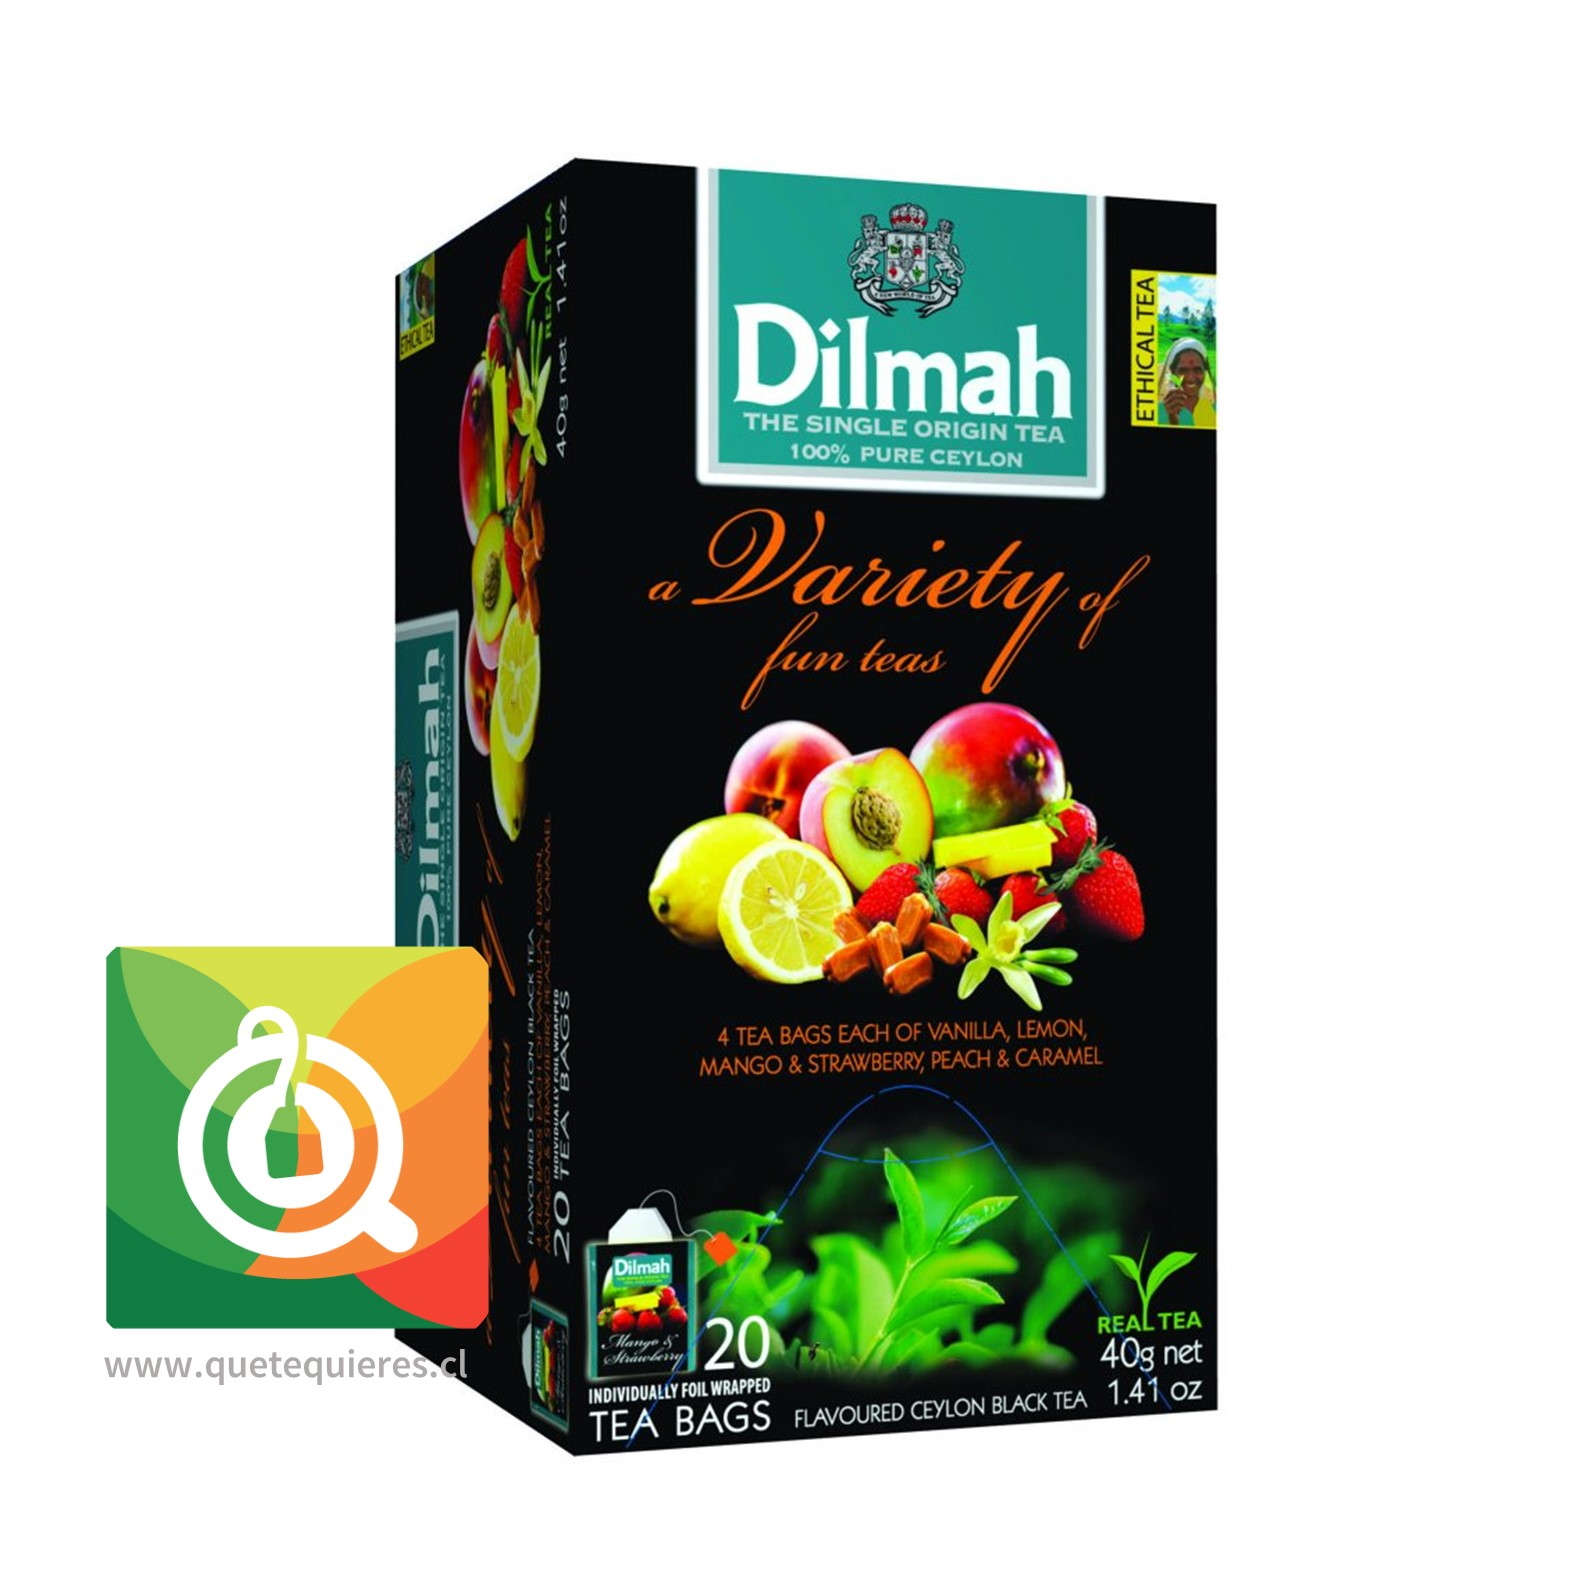 Dilmah Té Variety of fun teas 20 x 2 gr- Image 1